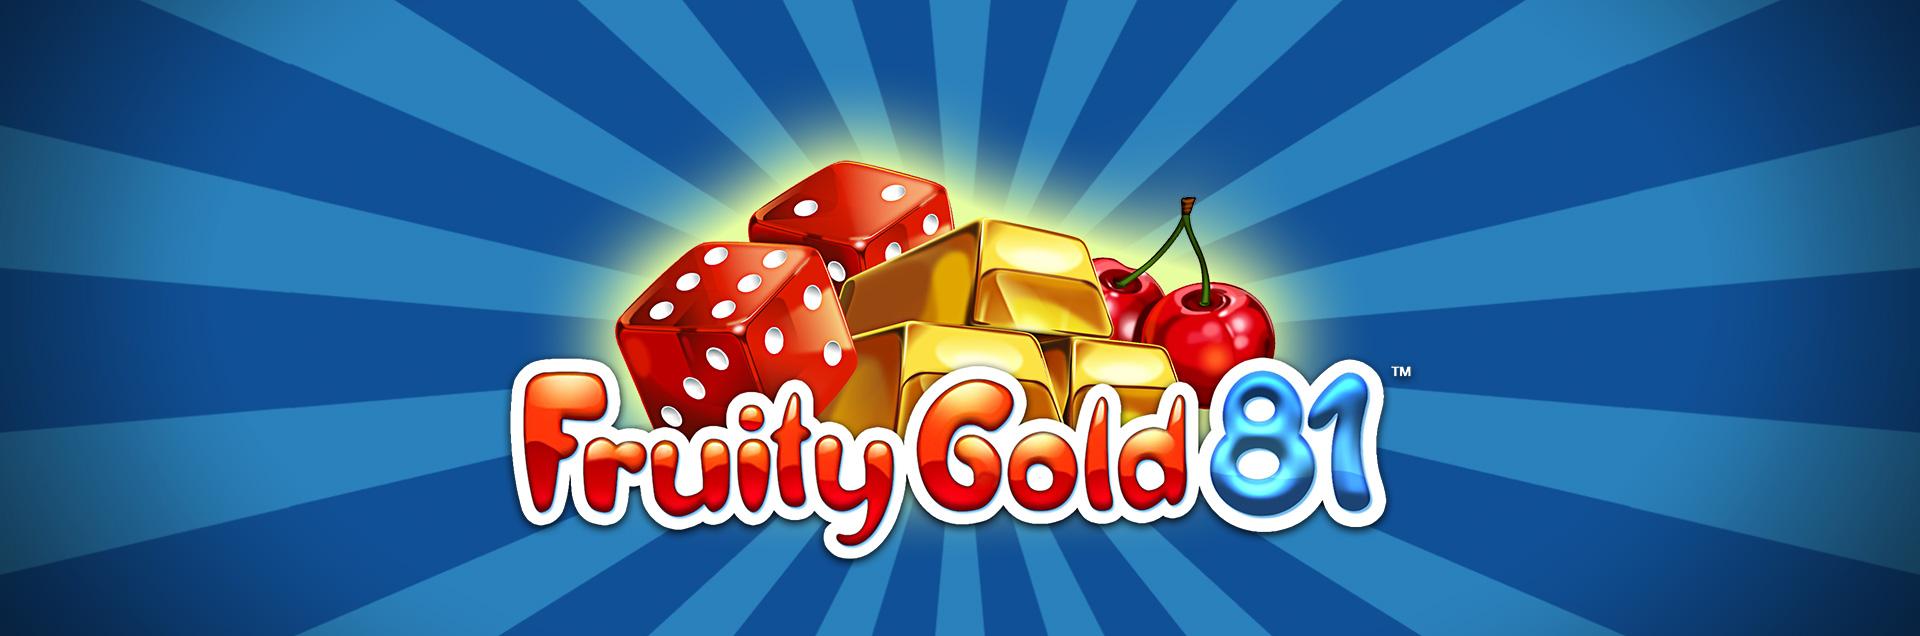 Fruity Gold 81 header games